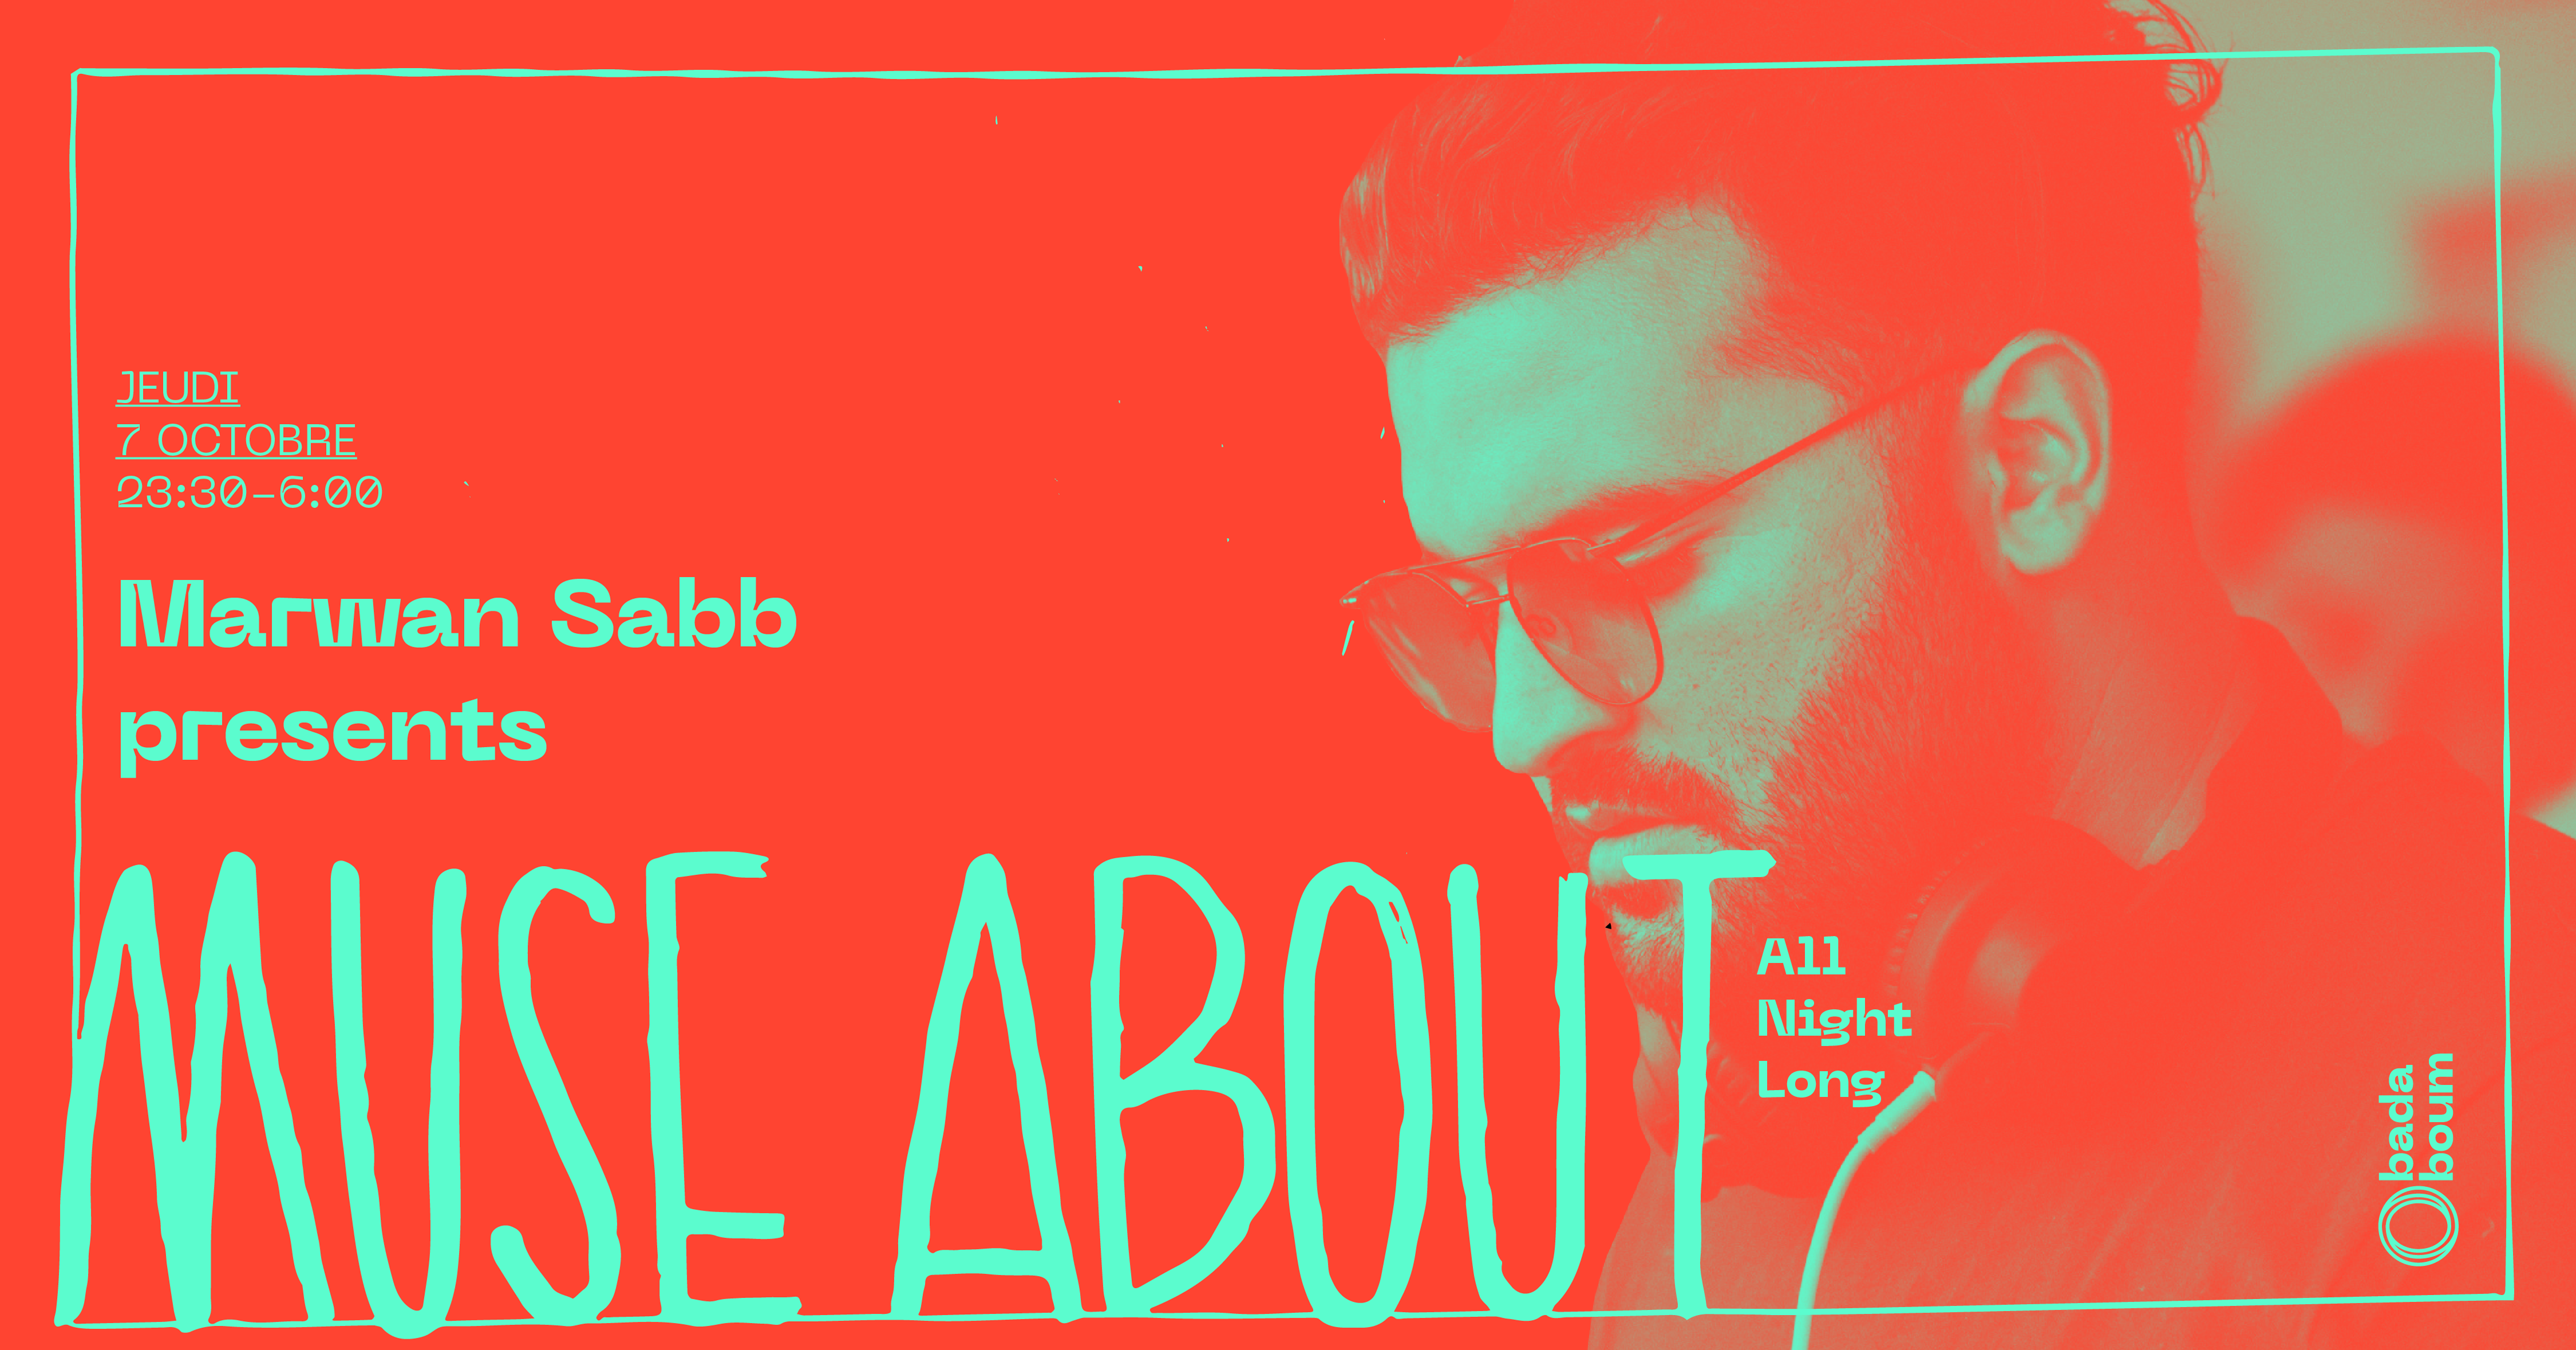 Badaboum Club : Marwan Sabb present MUSE ABOUT all night long